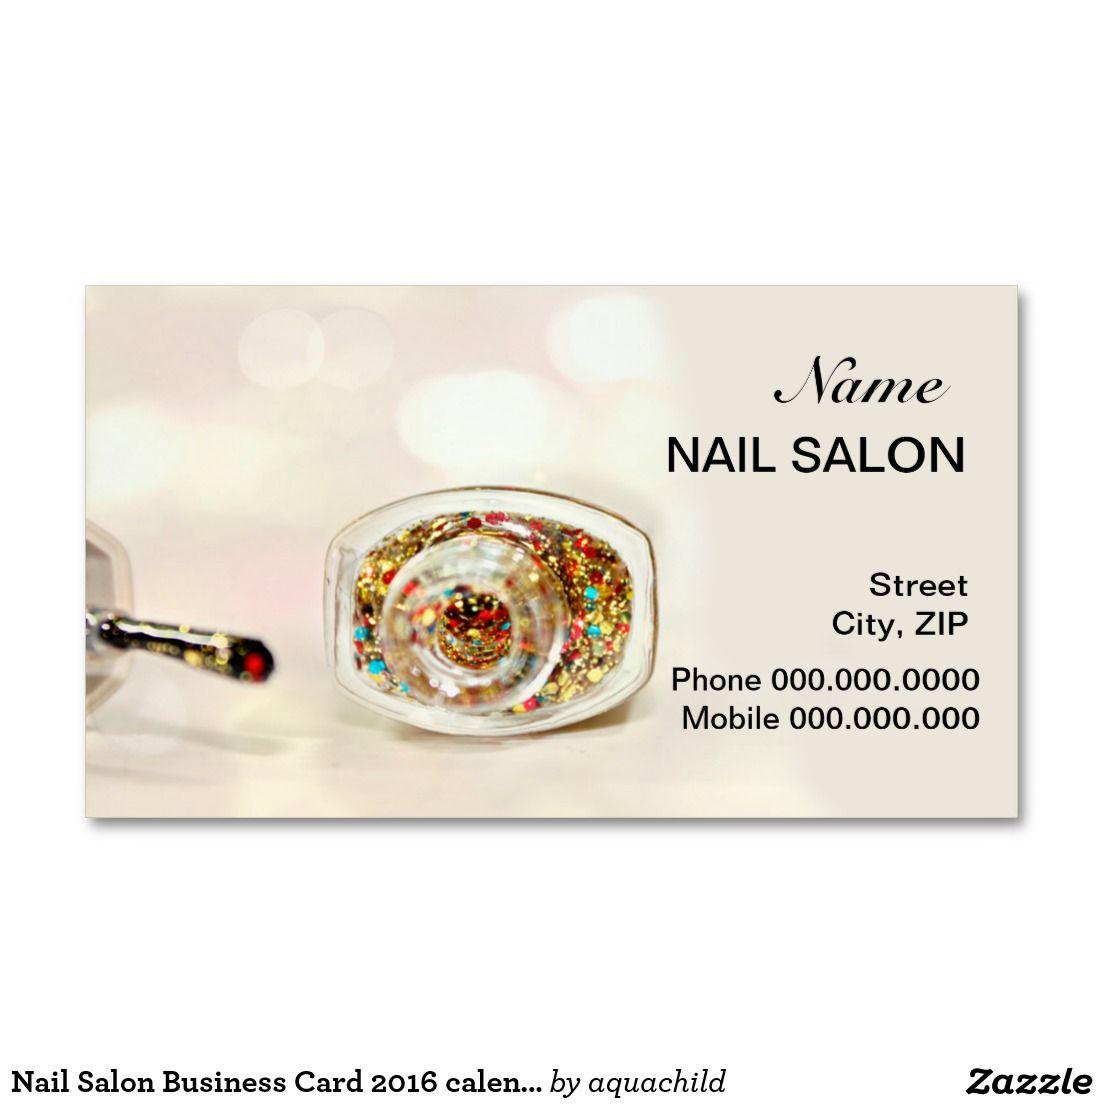 Nail Salon Business Card 2016 calendar | Nail salons, Business ...